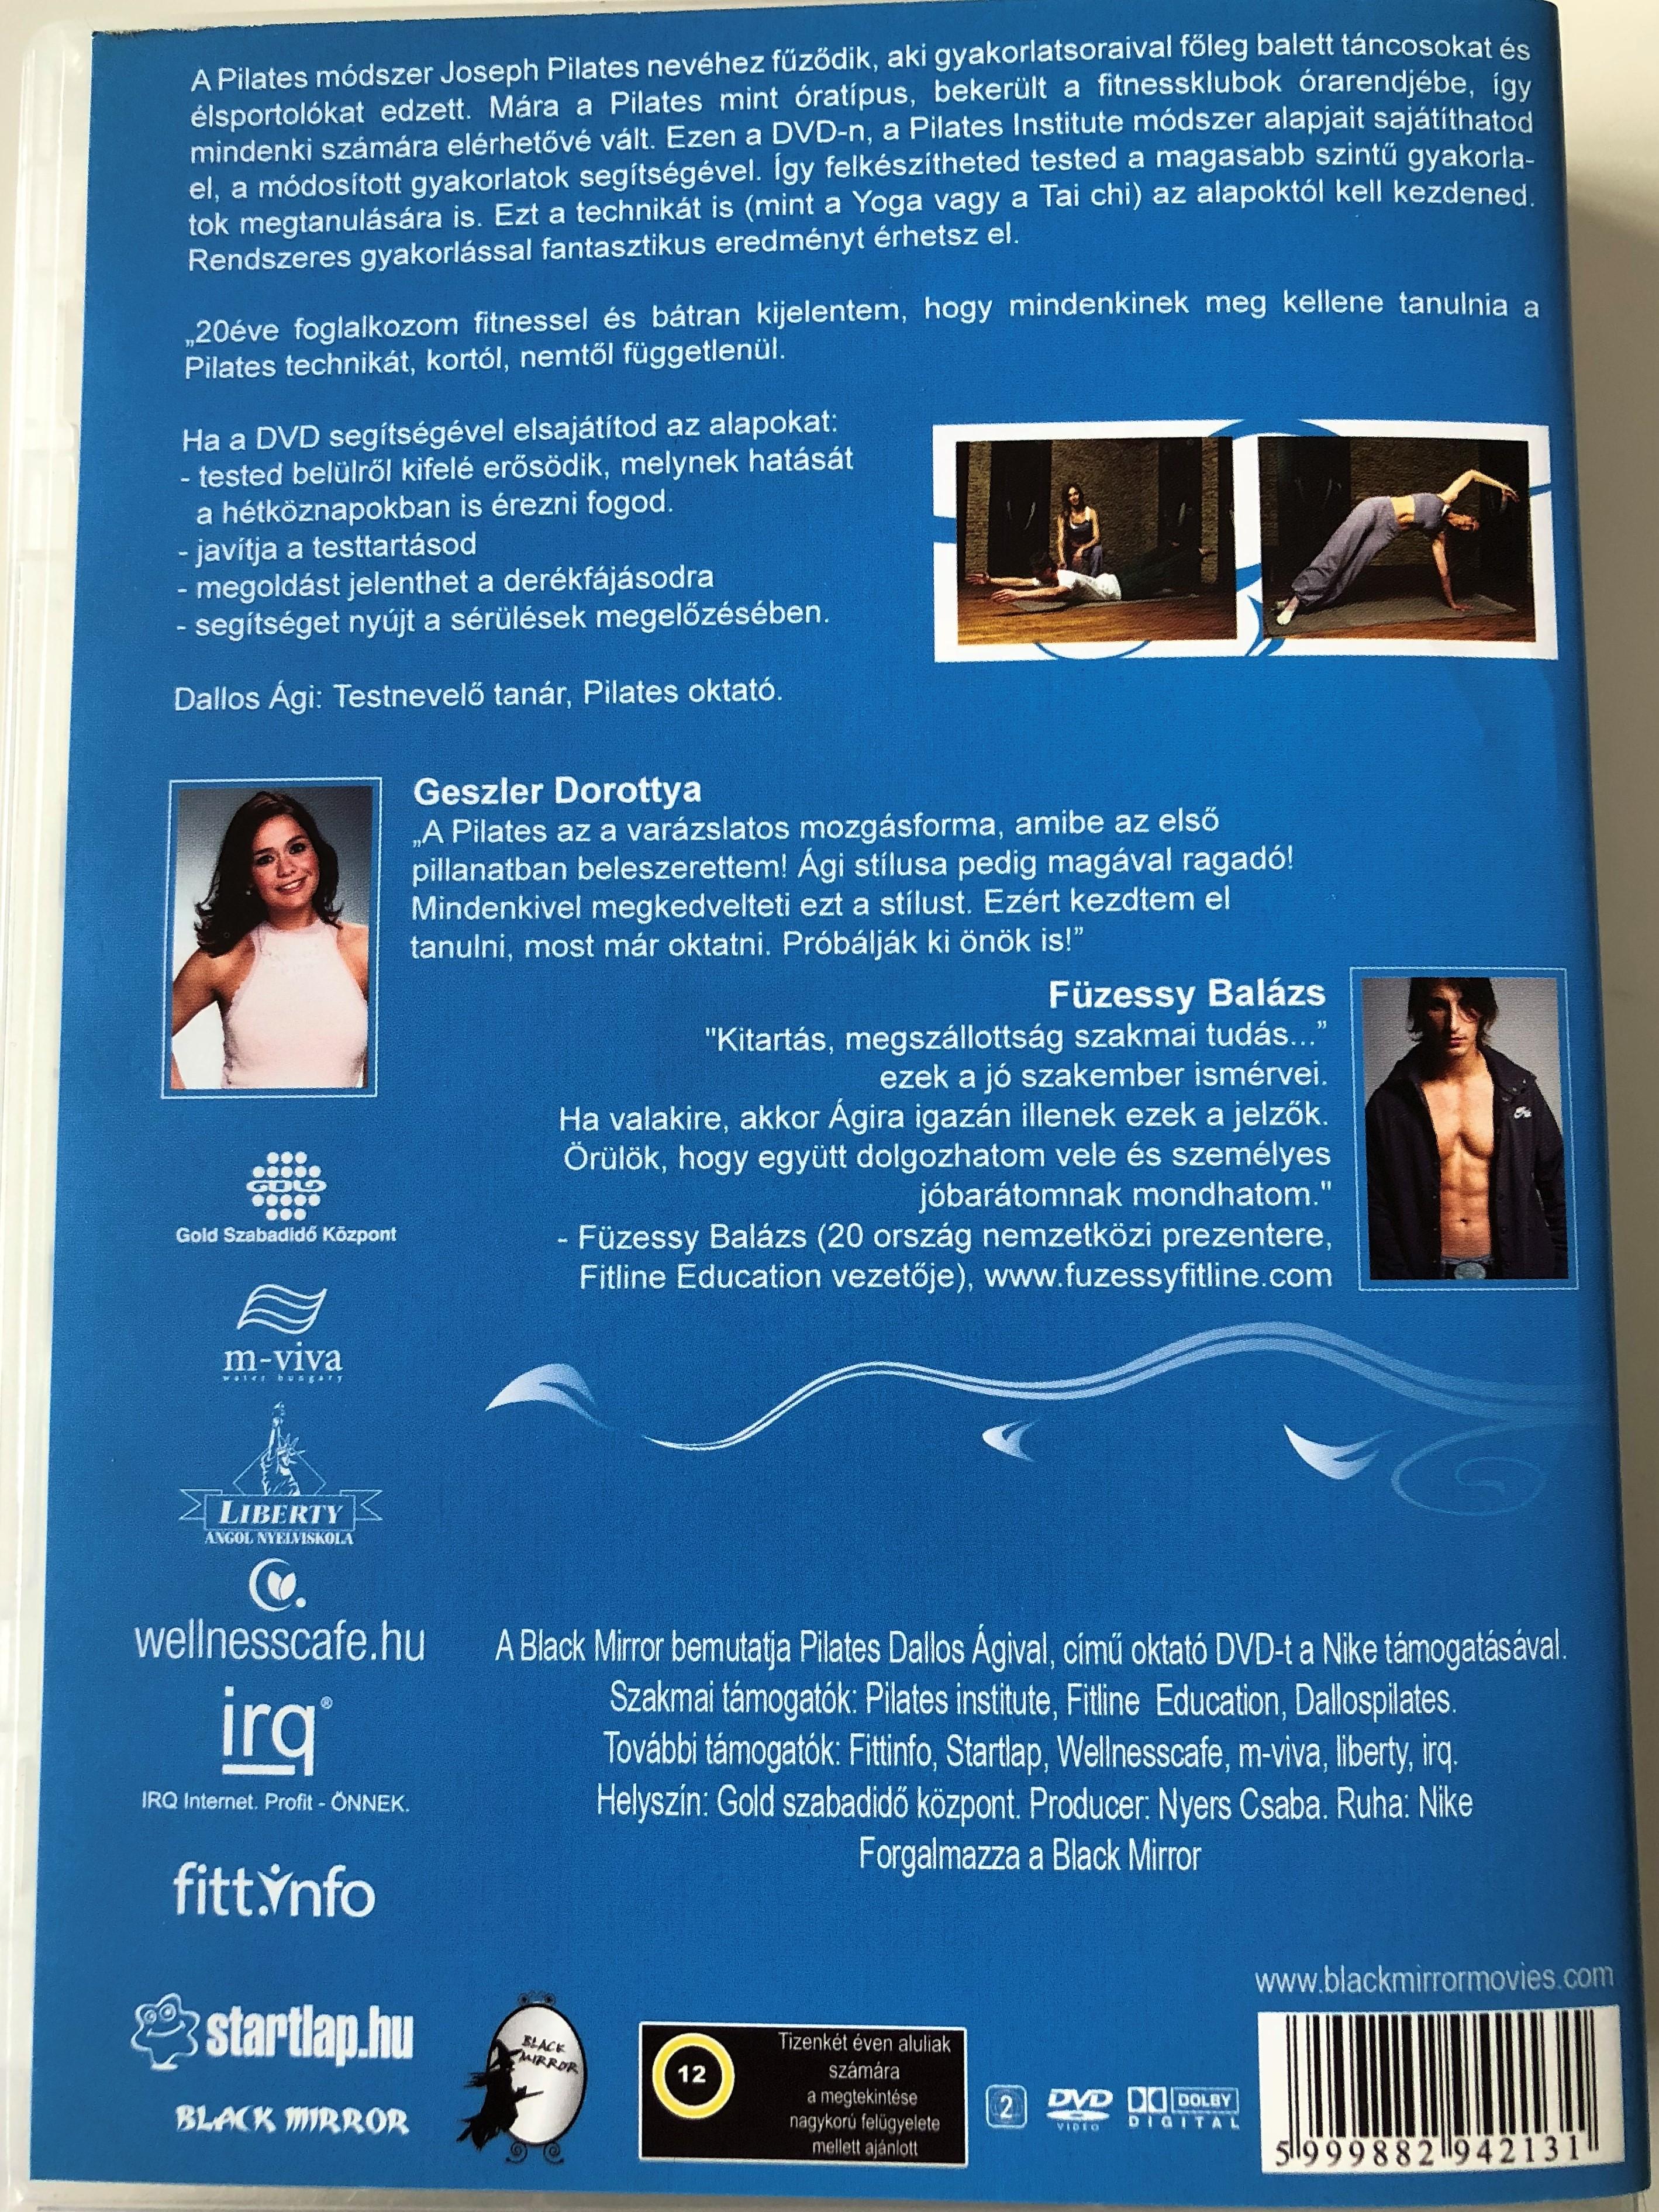 pilates-dallos-gival-dvd-2007-directed-by-dallos-gi-nike-women-pilates-institute-2-.jpg